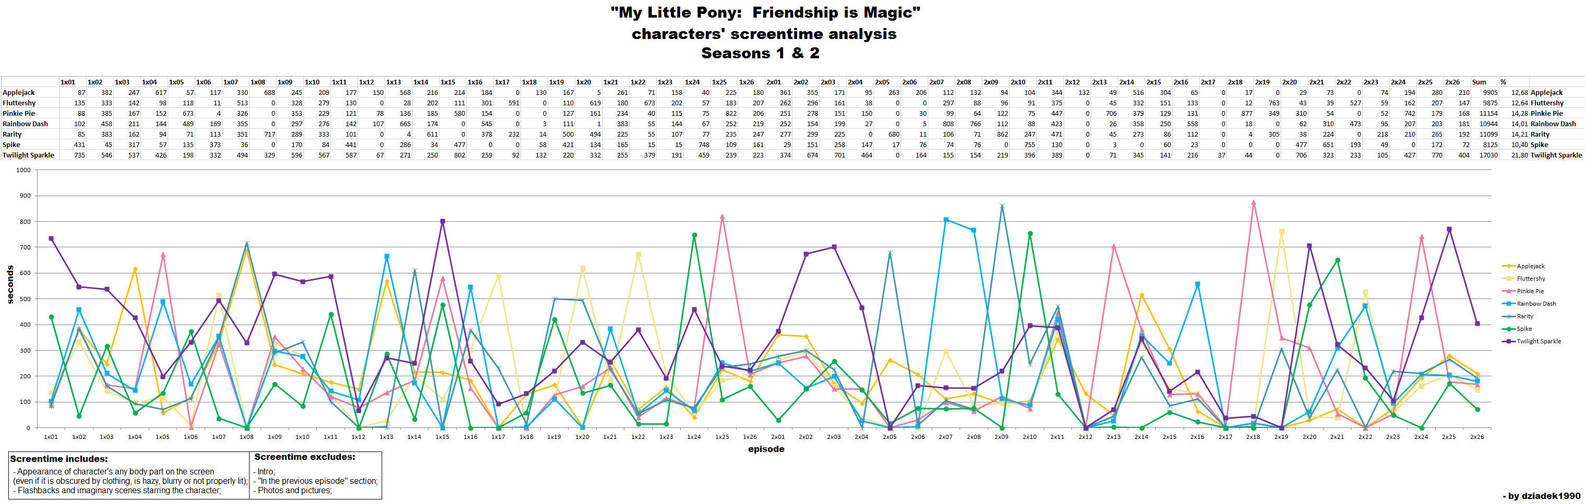 MLP FIM S1 and S2 characters' screentime analysis by dziadek1990